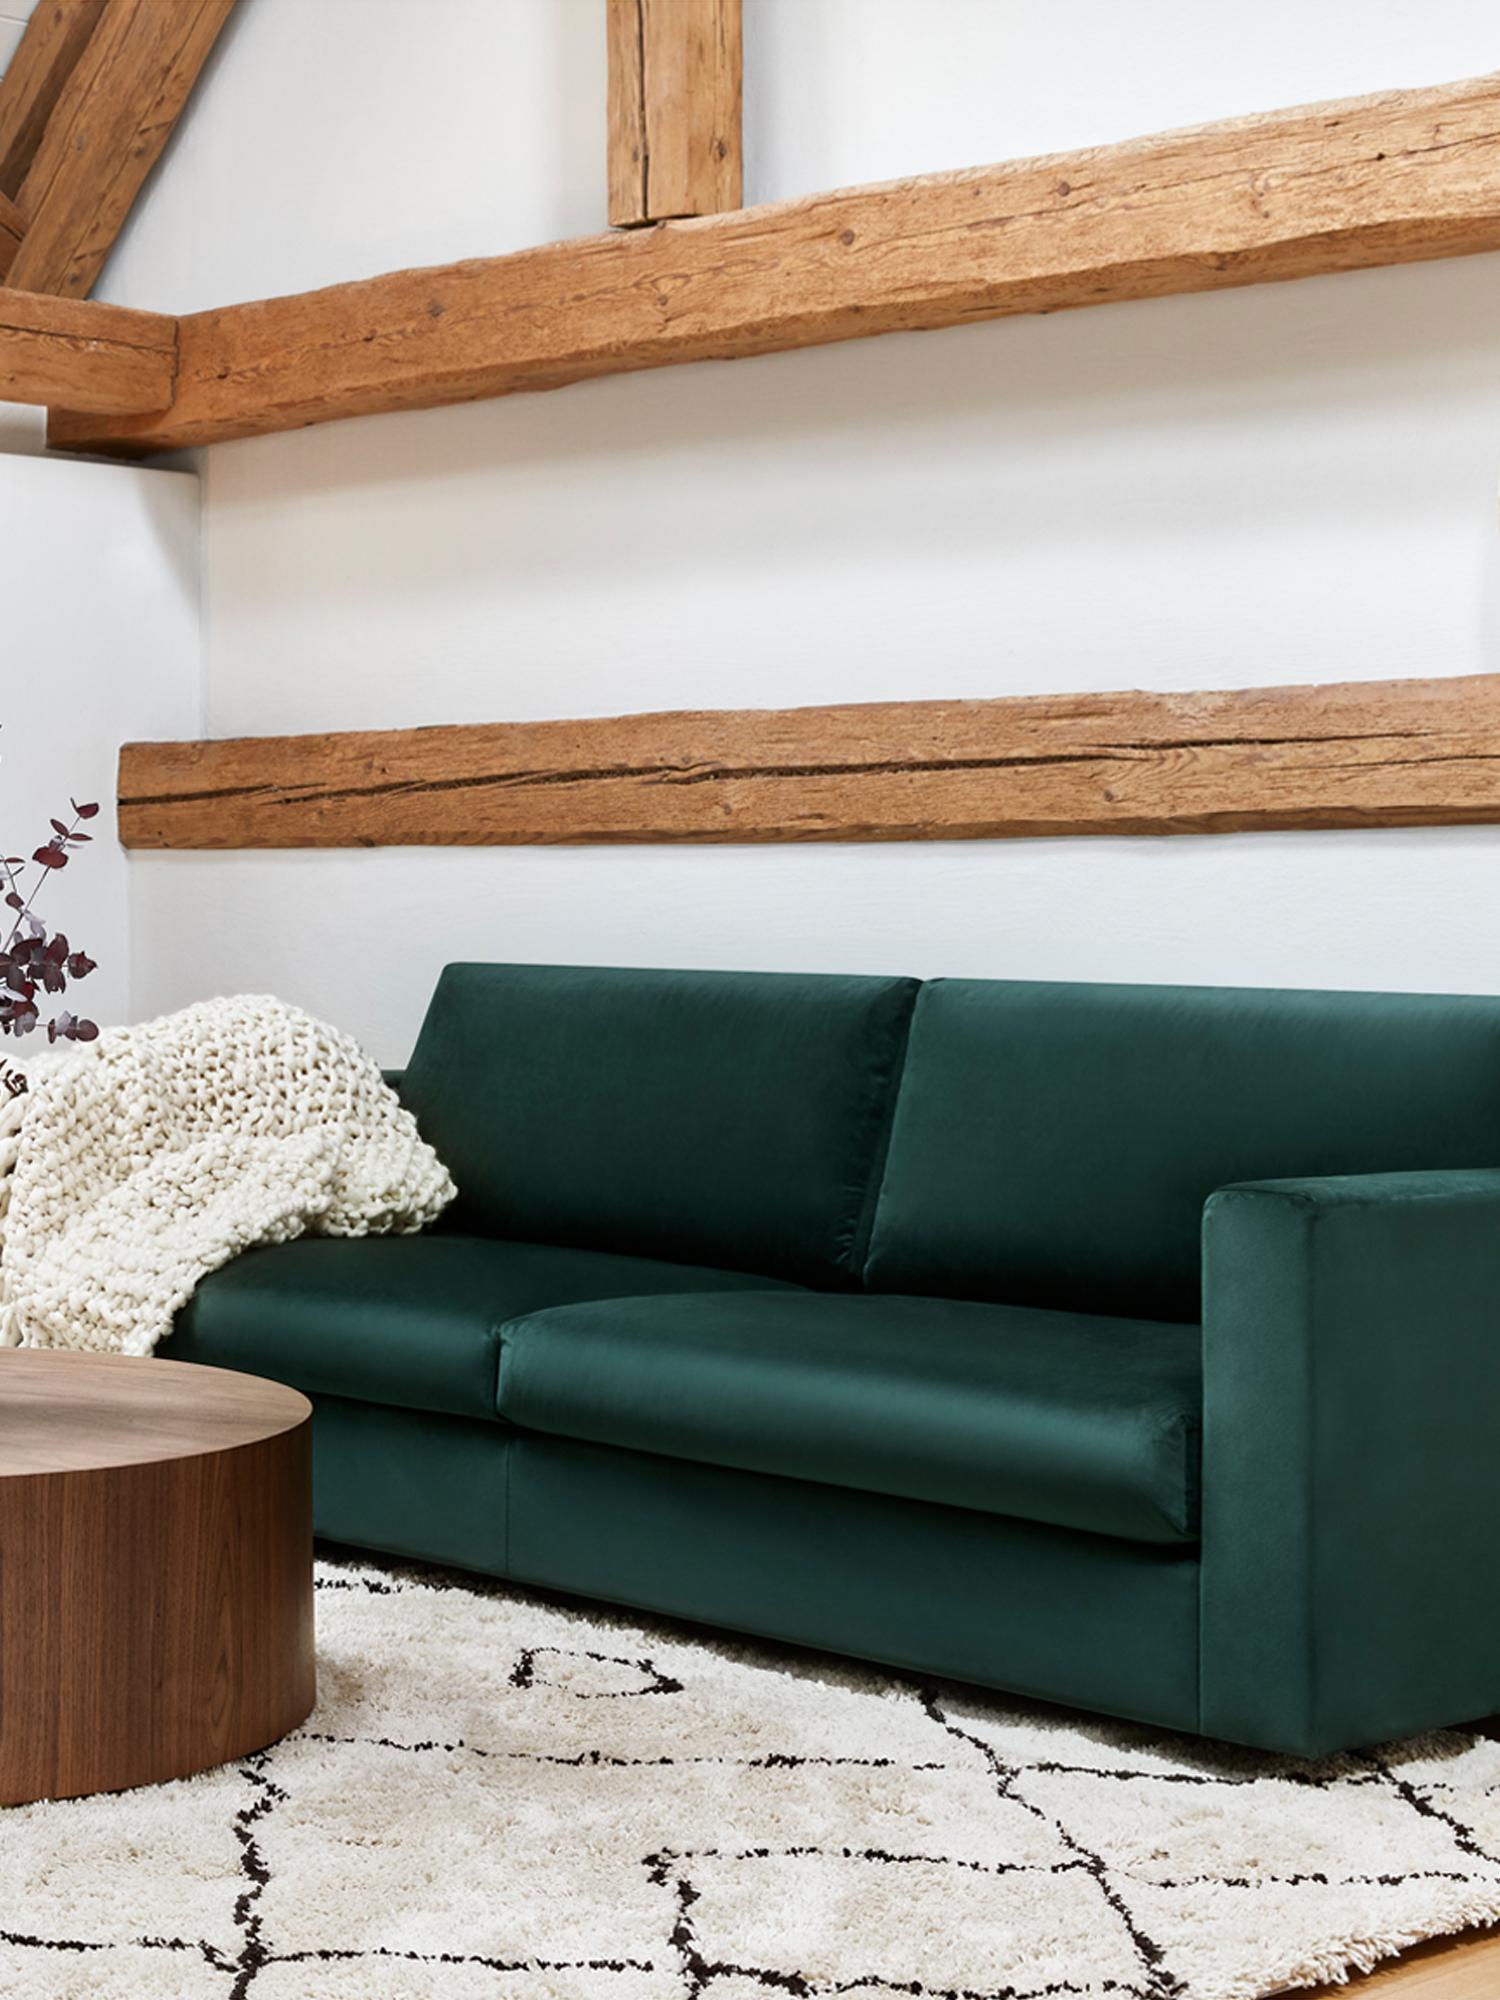 Fluwelen bank Balmira (3-zits), Bekleding: fluweel (polyester), Frame: massief grenenhout, Poten: massief gelakt berkenhout, Donkergroen, B 240 x D 96 cm